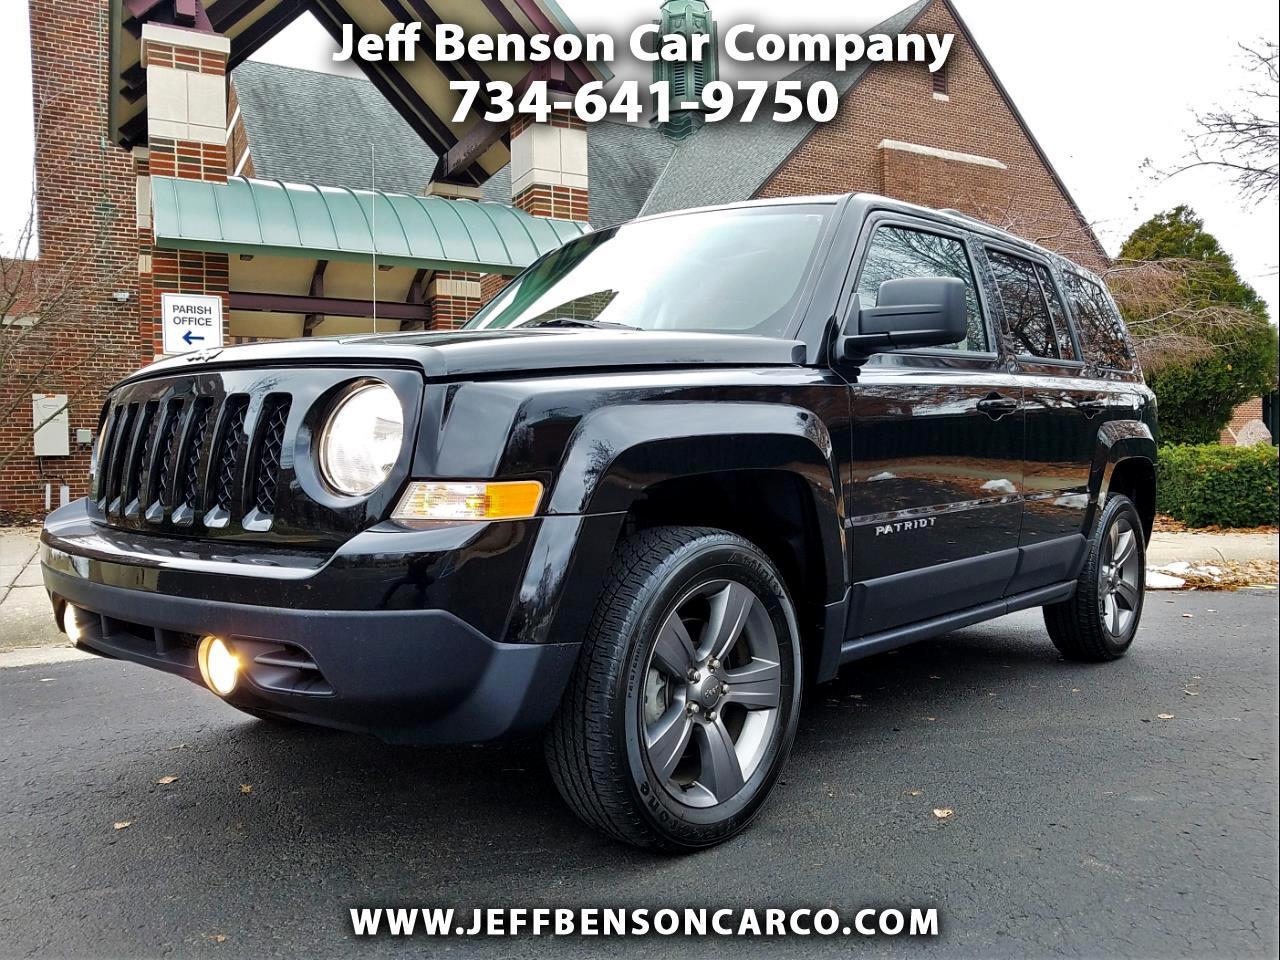 2015 Jeep Patriot 4WD 4dr High Altitude Edition